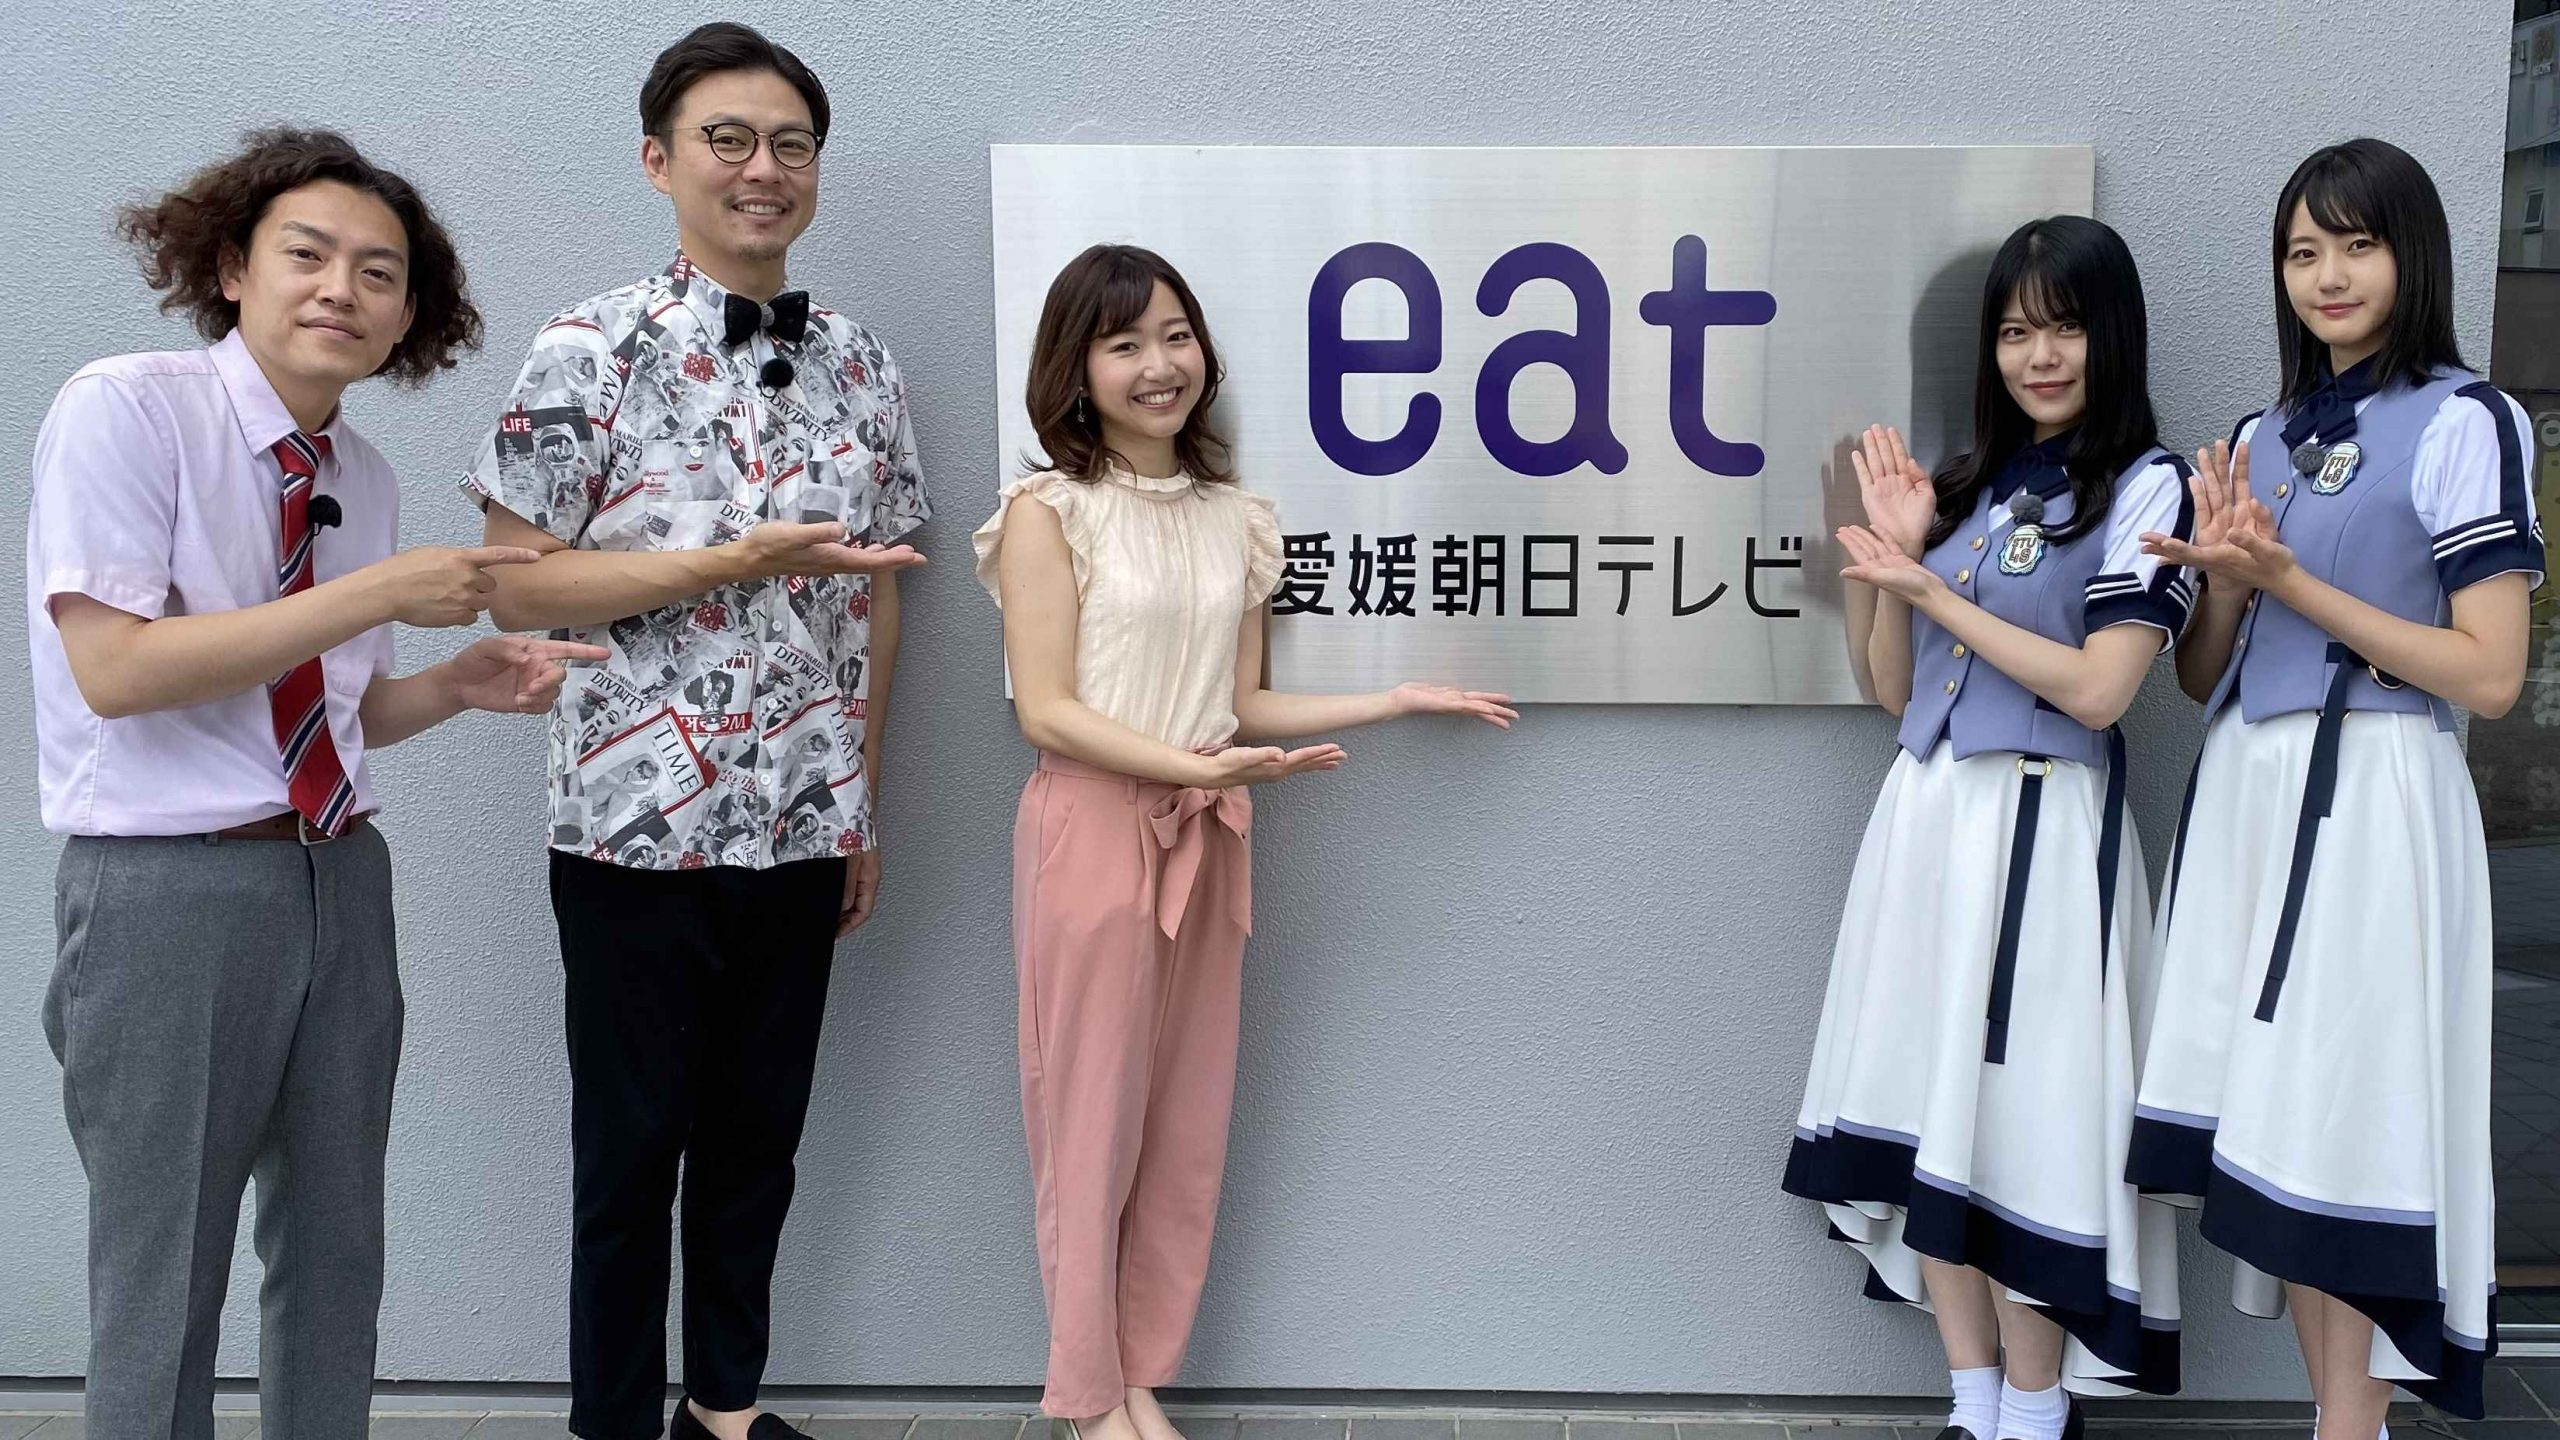 STU48・瀧野由美子、矢野帆夏、学天即が愛媛朝日テレビを訪問